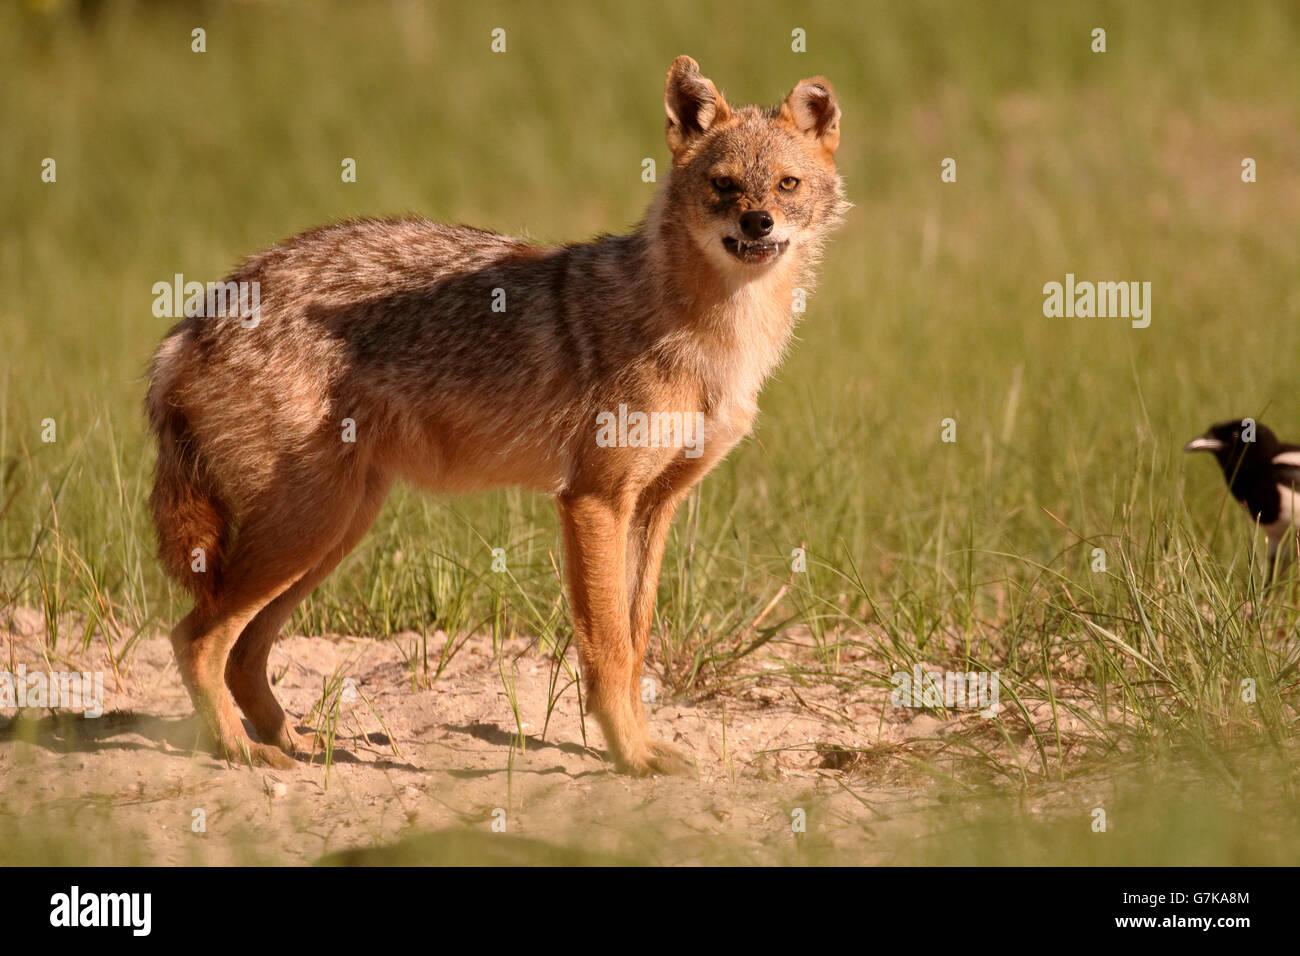 Europäische Schakal, Canis Aureus Moreoticus, einziges Säugetier auf Rasen, Rumänien, Juni 2016 Stockfoto